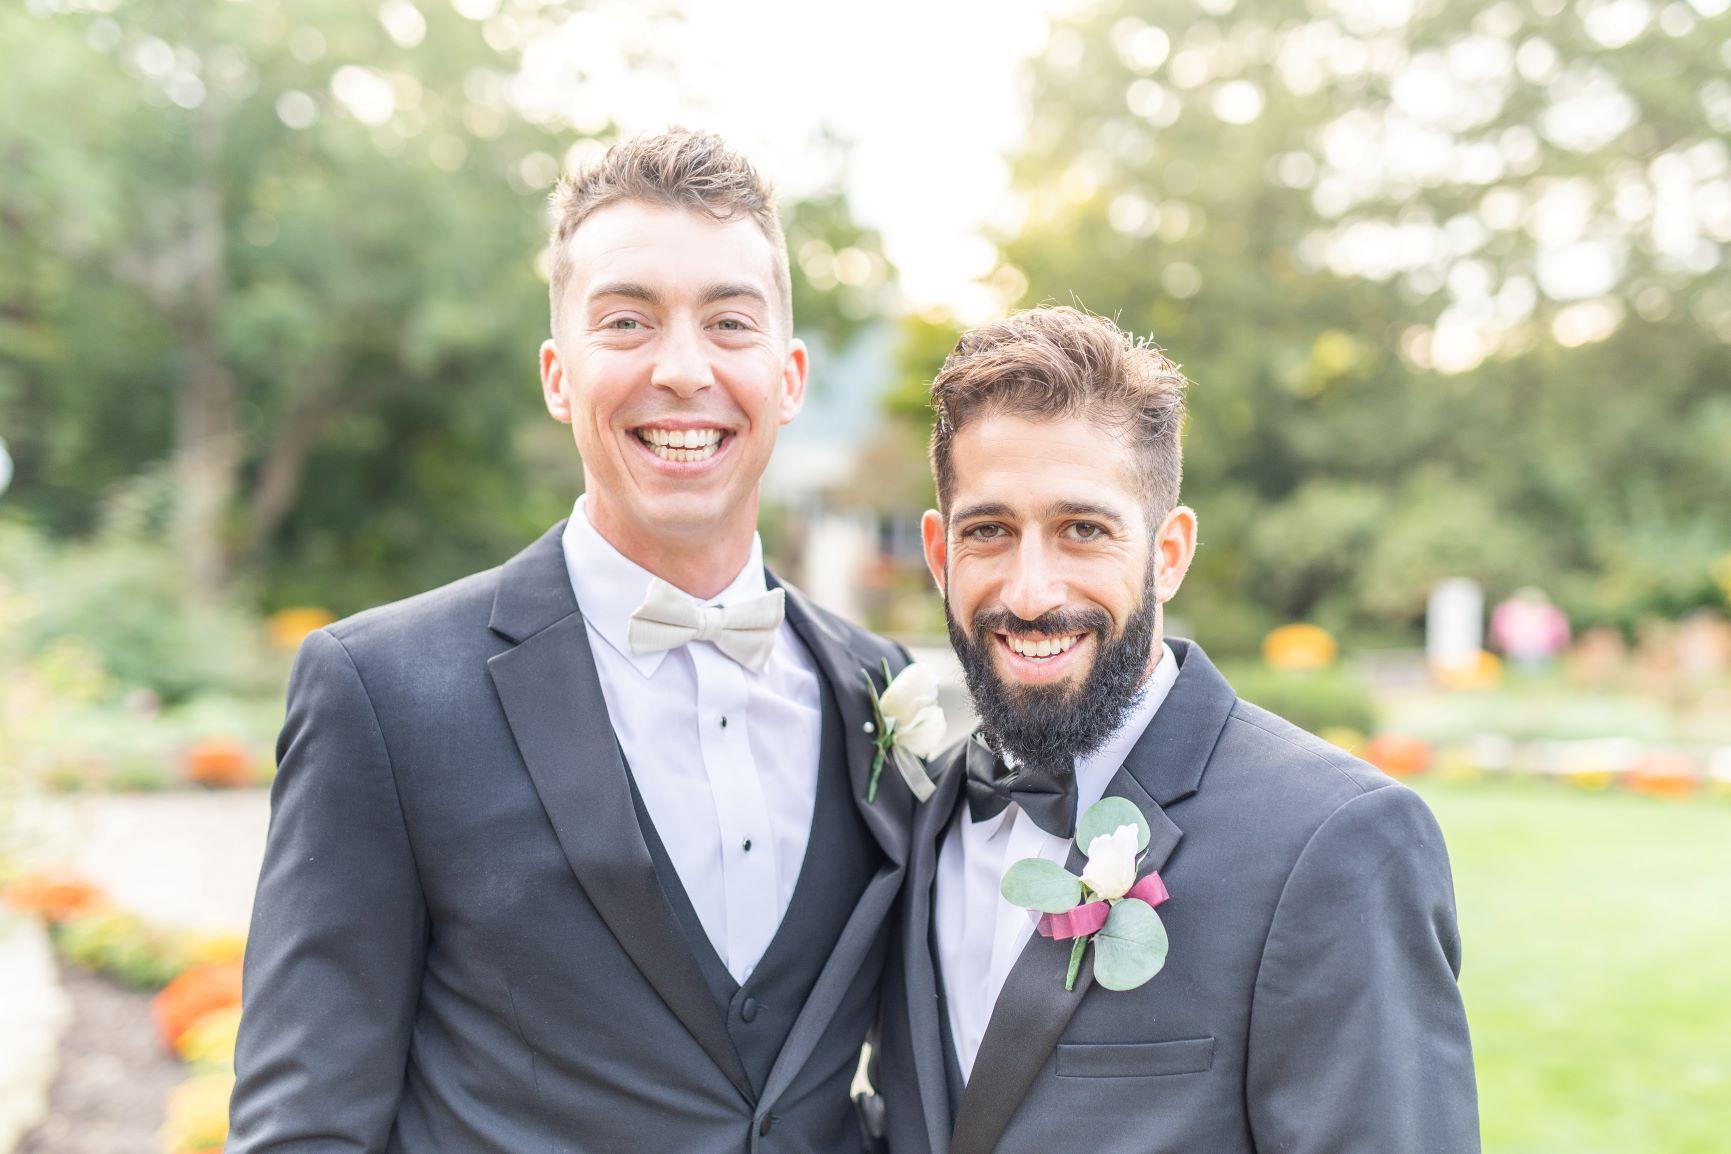 groom standing next to his groomsman wearing matching black tuxedos